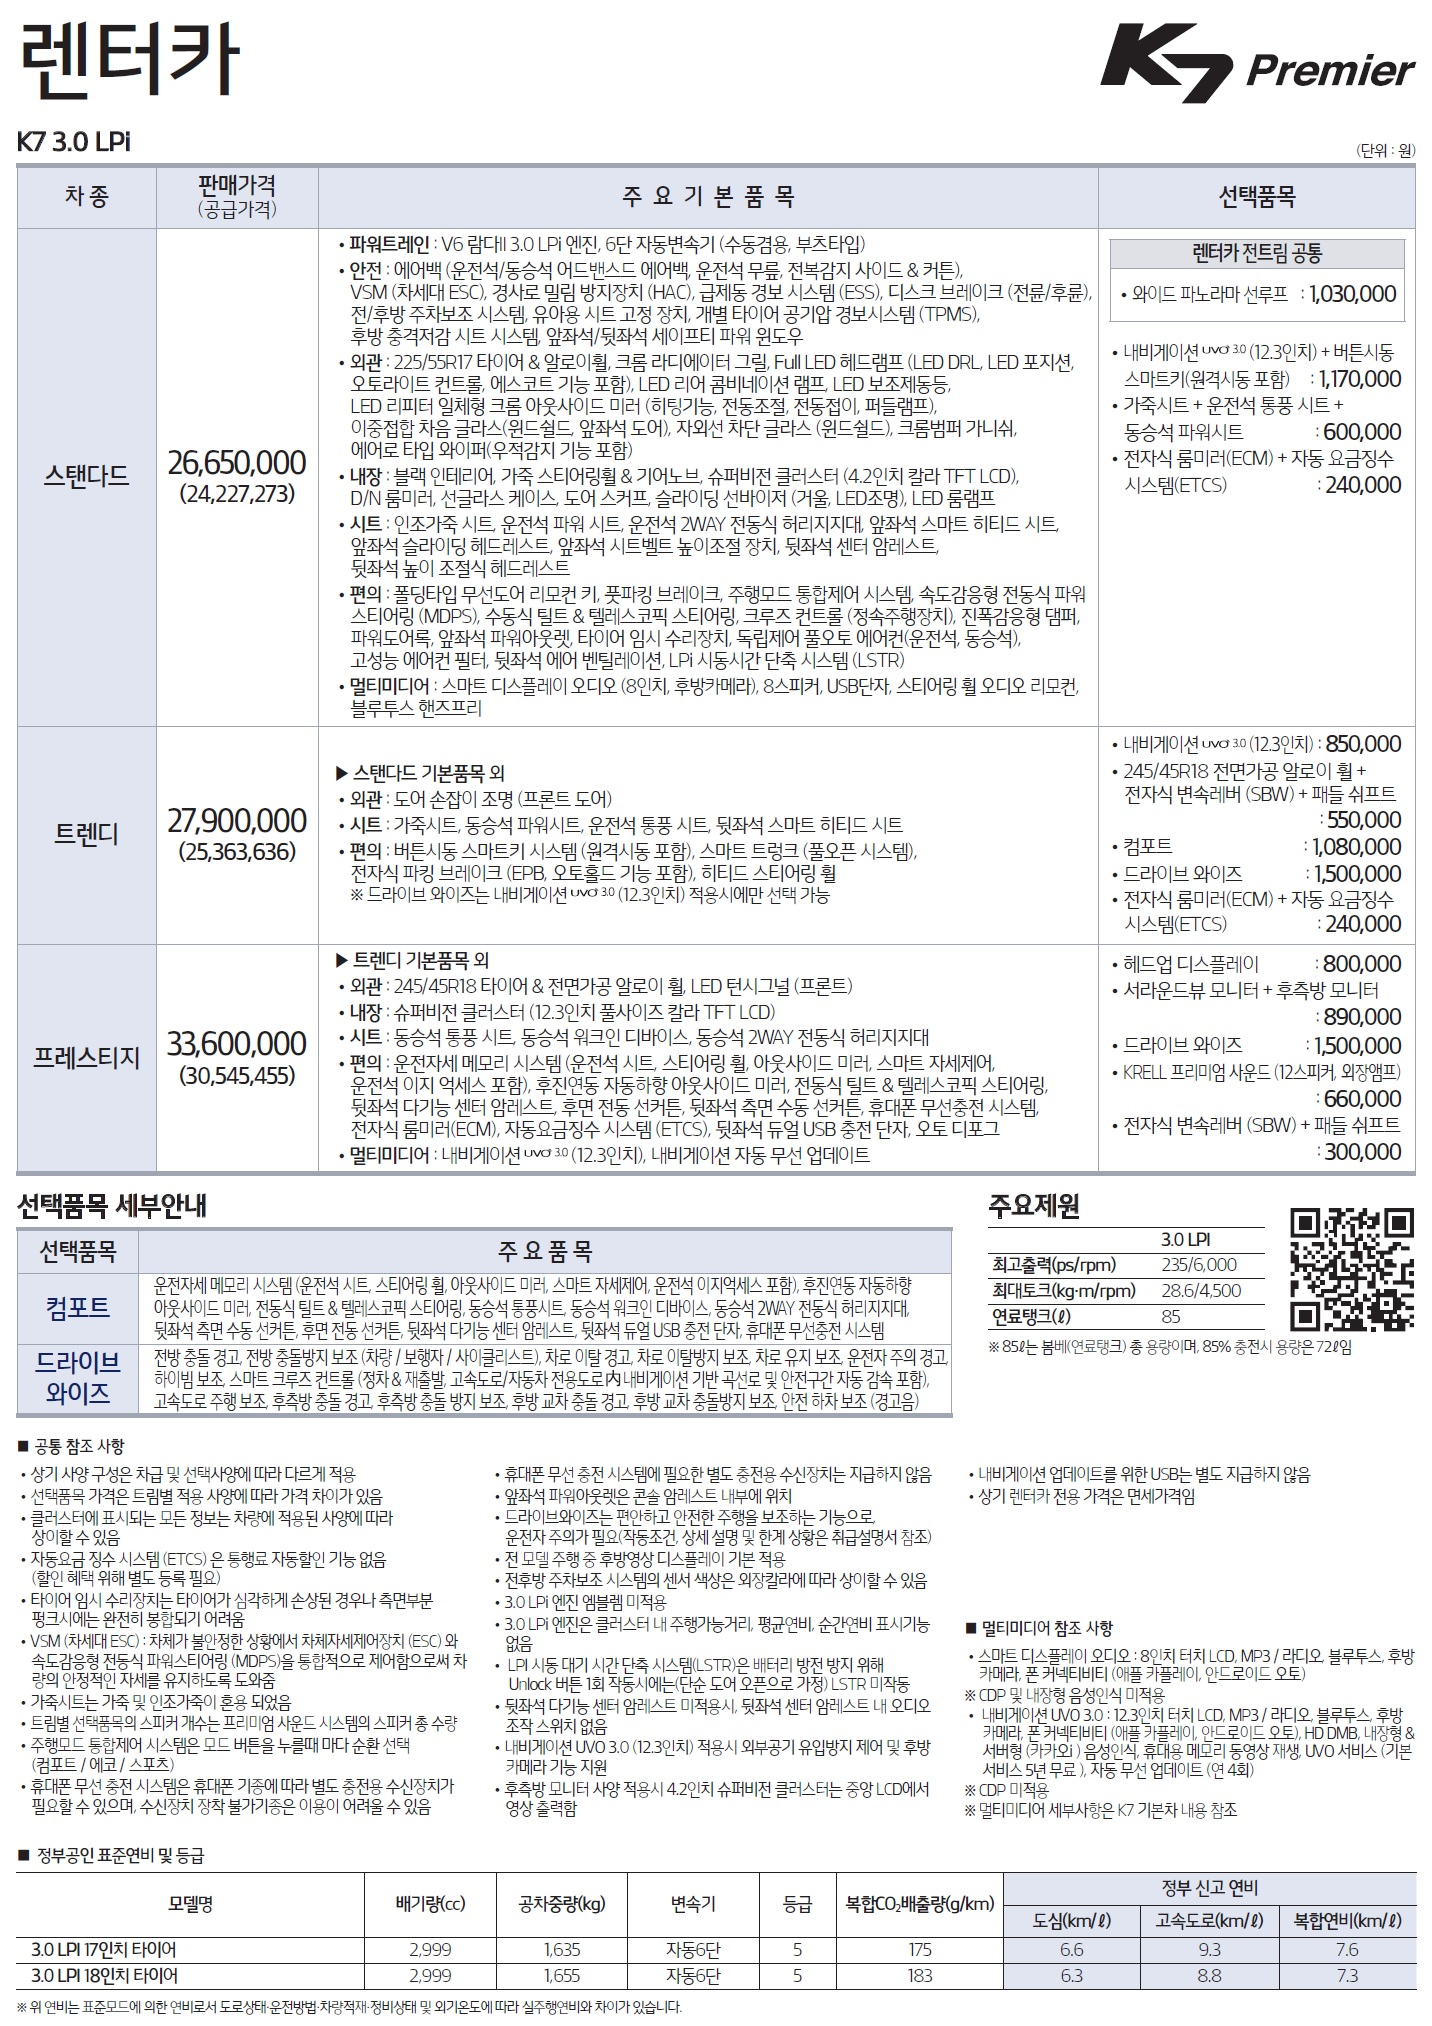 k7 가격표 - 2019년 06월 -5.jpg